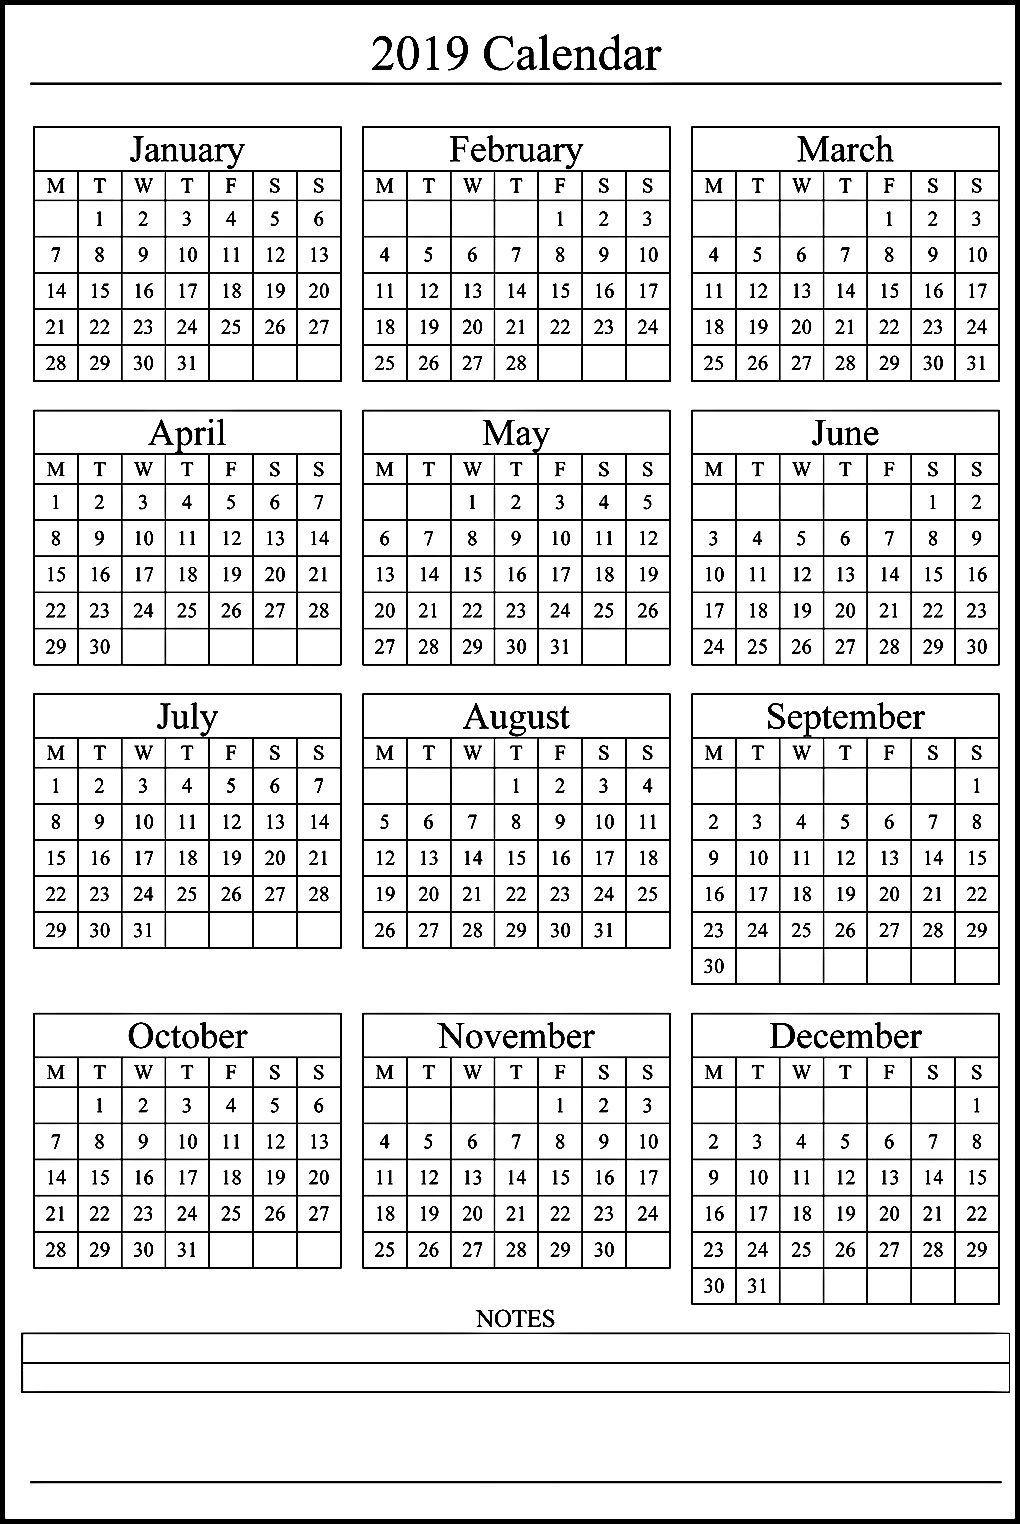 Incredible 12 Month View Calendar Printable Monthly Calendar Template Monthly Calendar Printable 12 Month Calendar Printable 12 month calendar template word